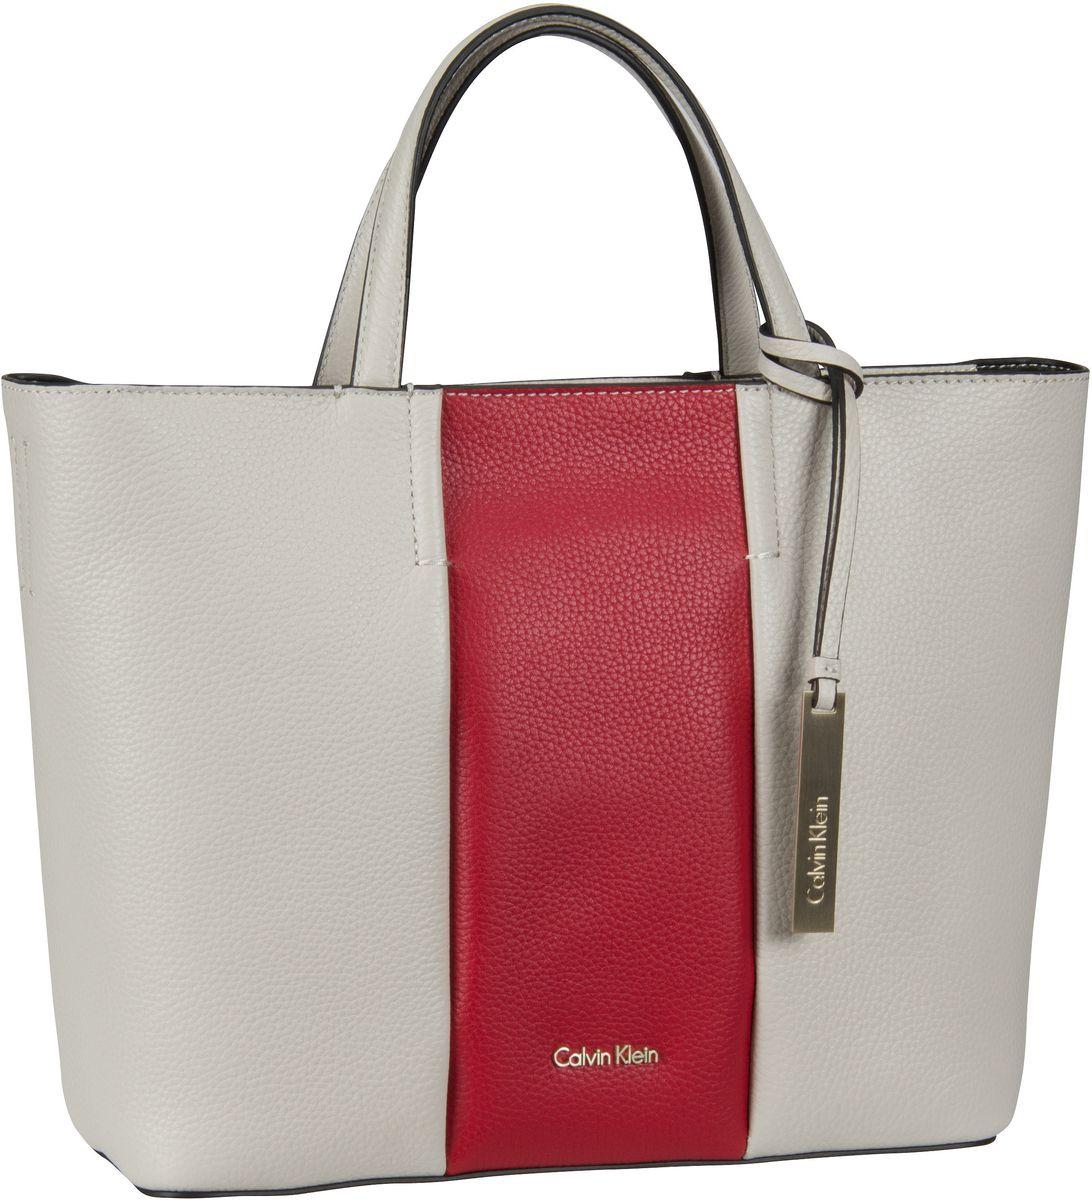 Handtasche Cosmopolitan Medium Tote Cement/Scarlet